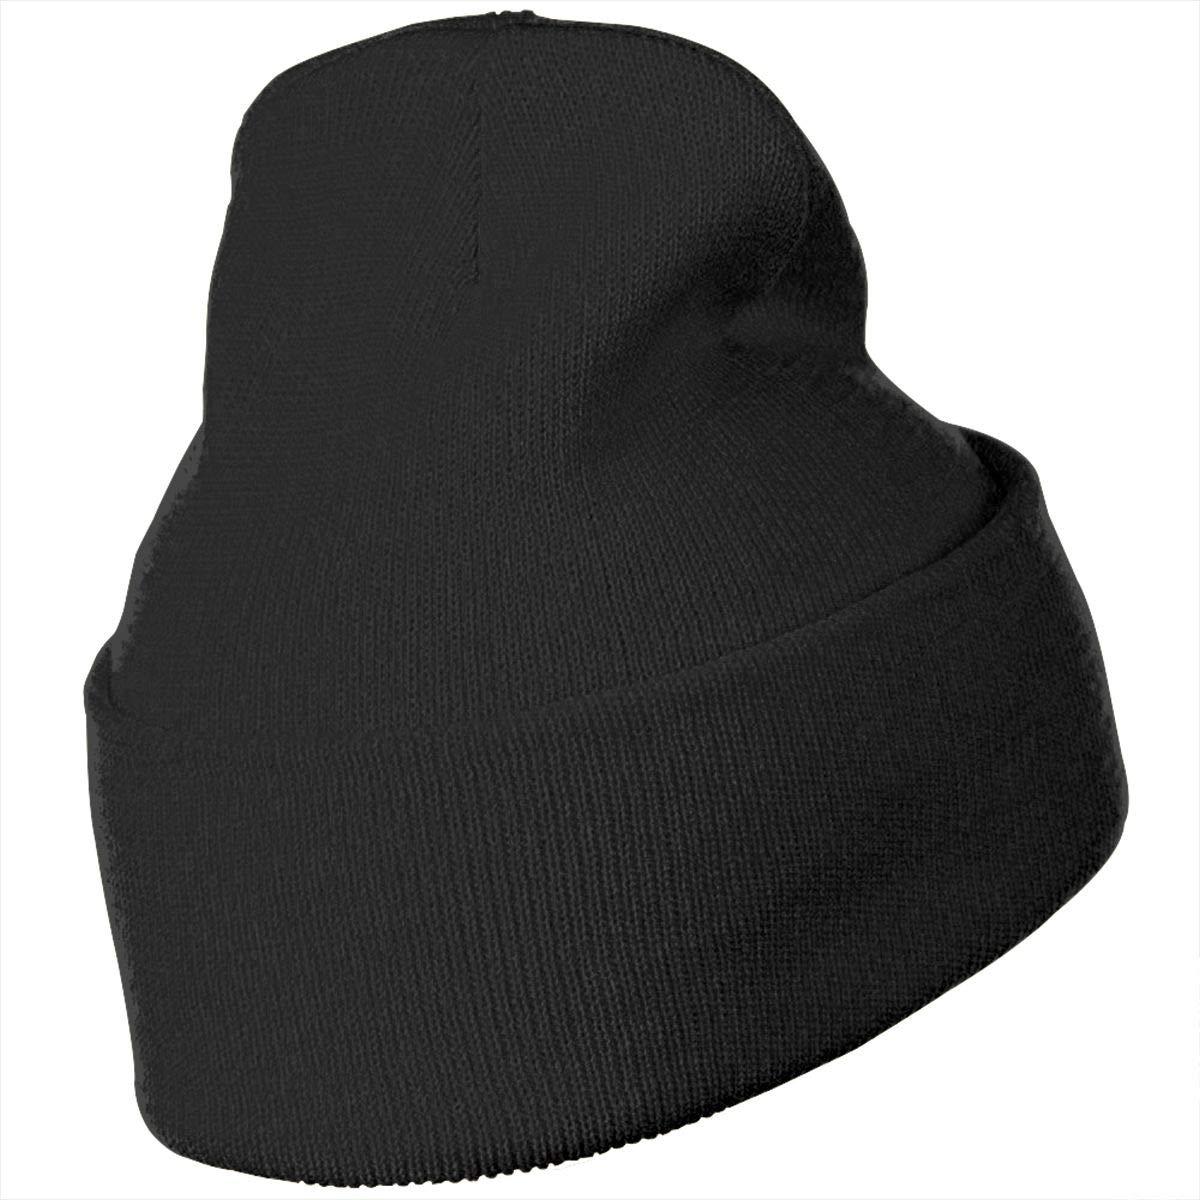 Palm Leaf Unisex Fashion Knitted Hat Luxury Hip-Hop Cap